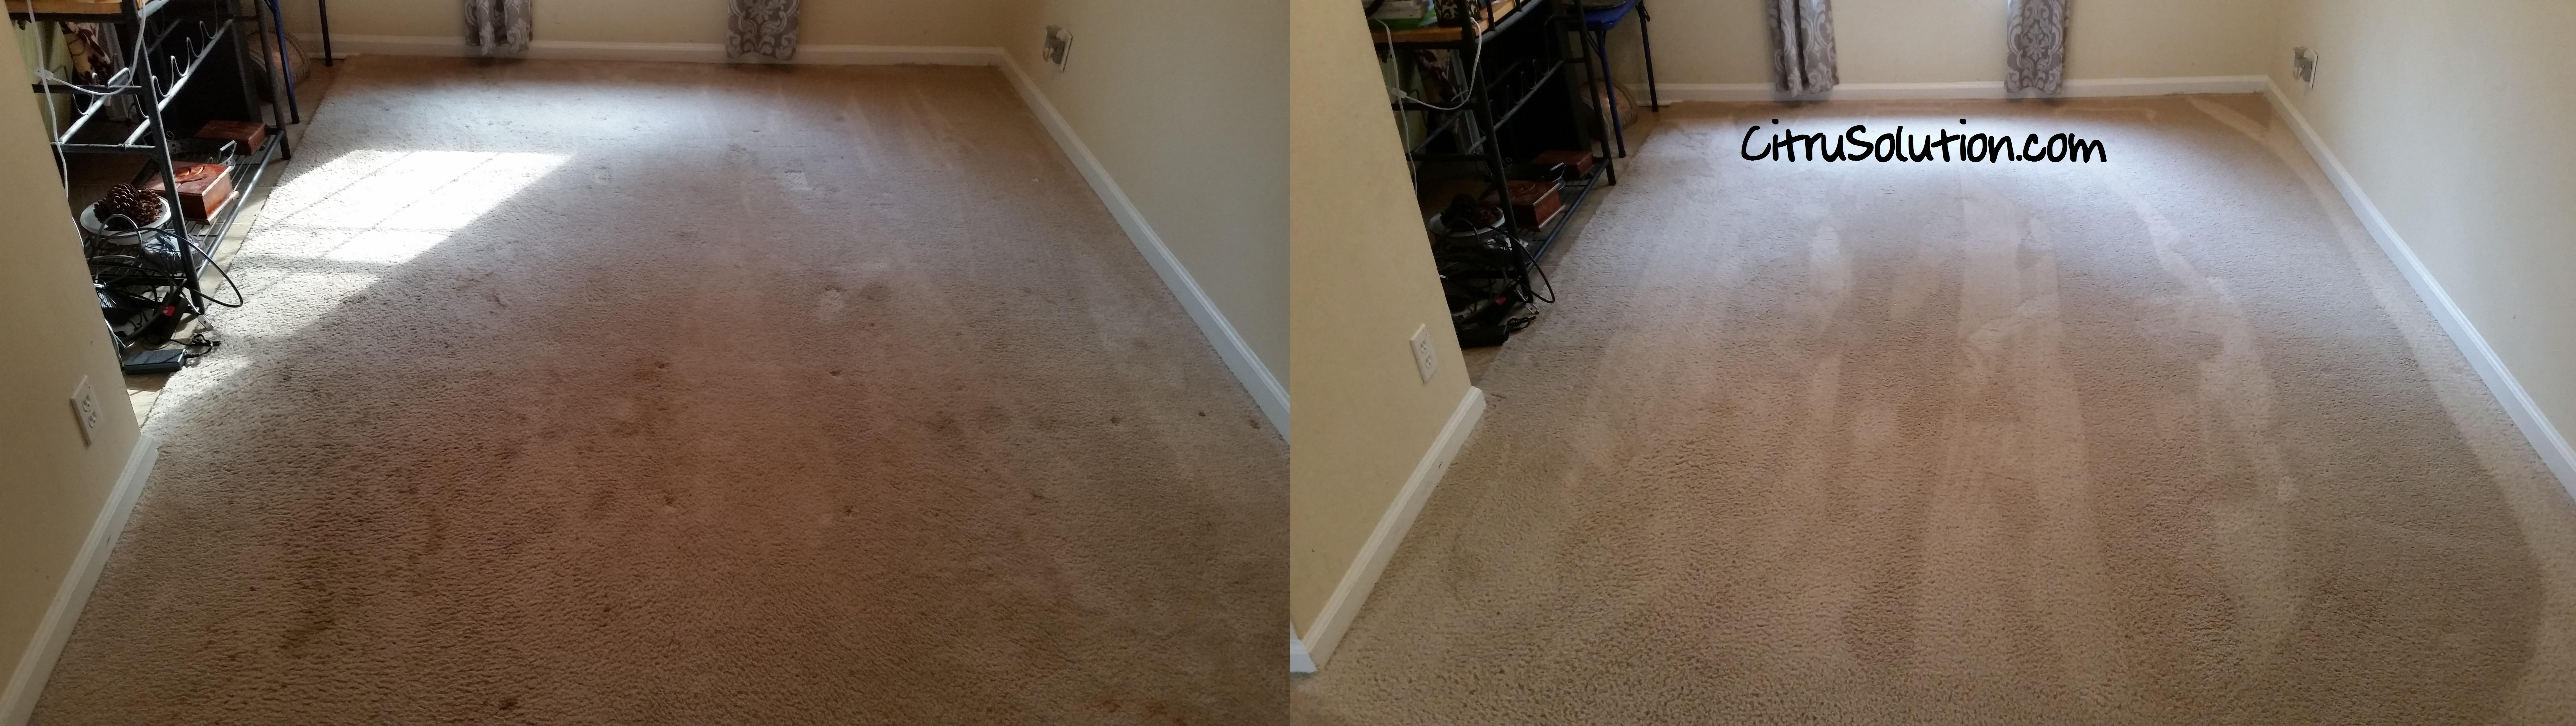 11-10-citrusolution-carpet-cleaning-4